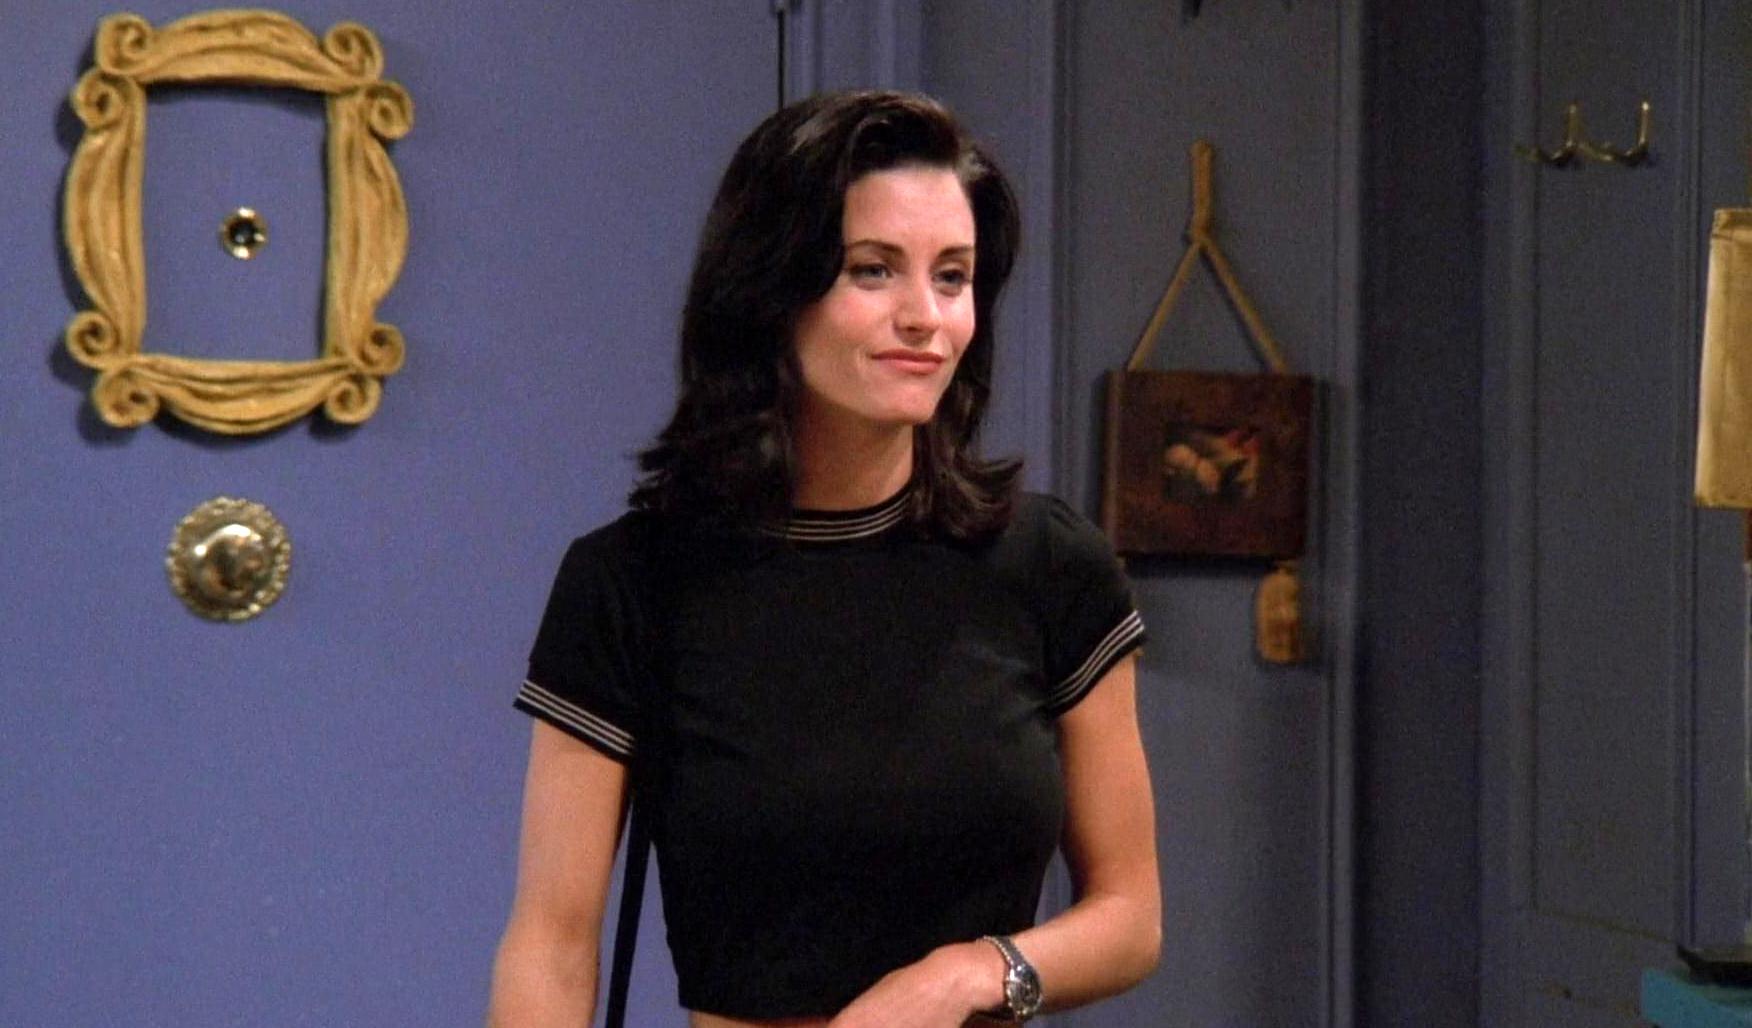 آخخخخ...مونیکا!: مرور ده داستانک بامزه سریال Friends